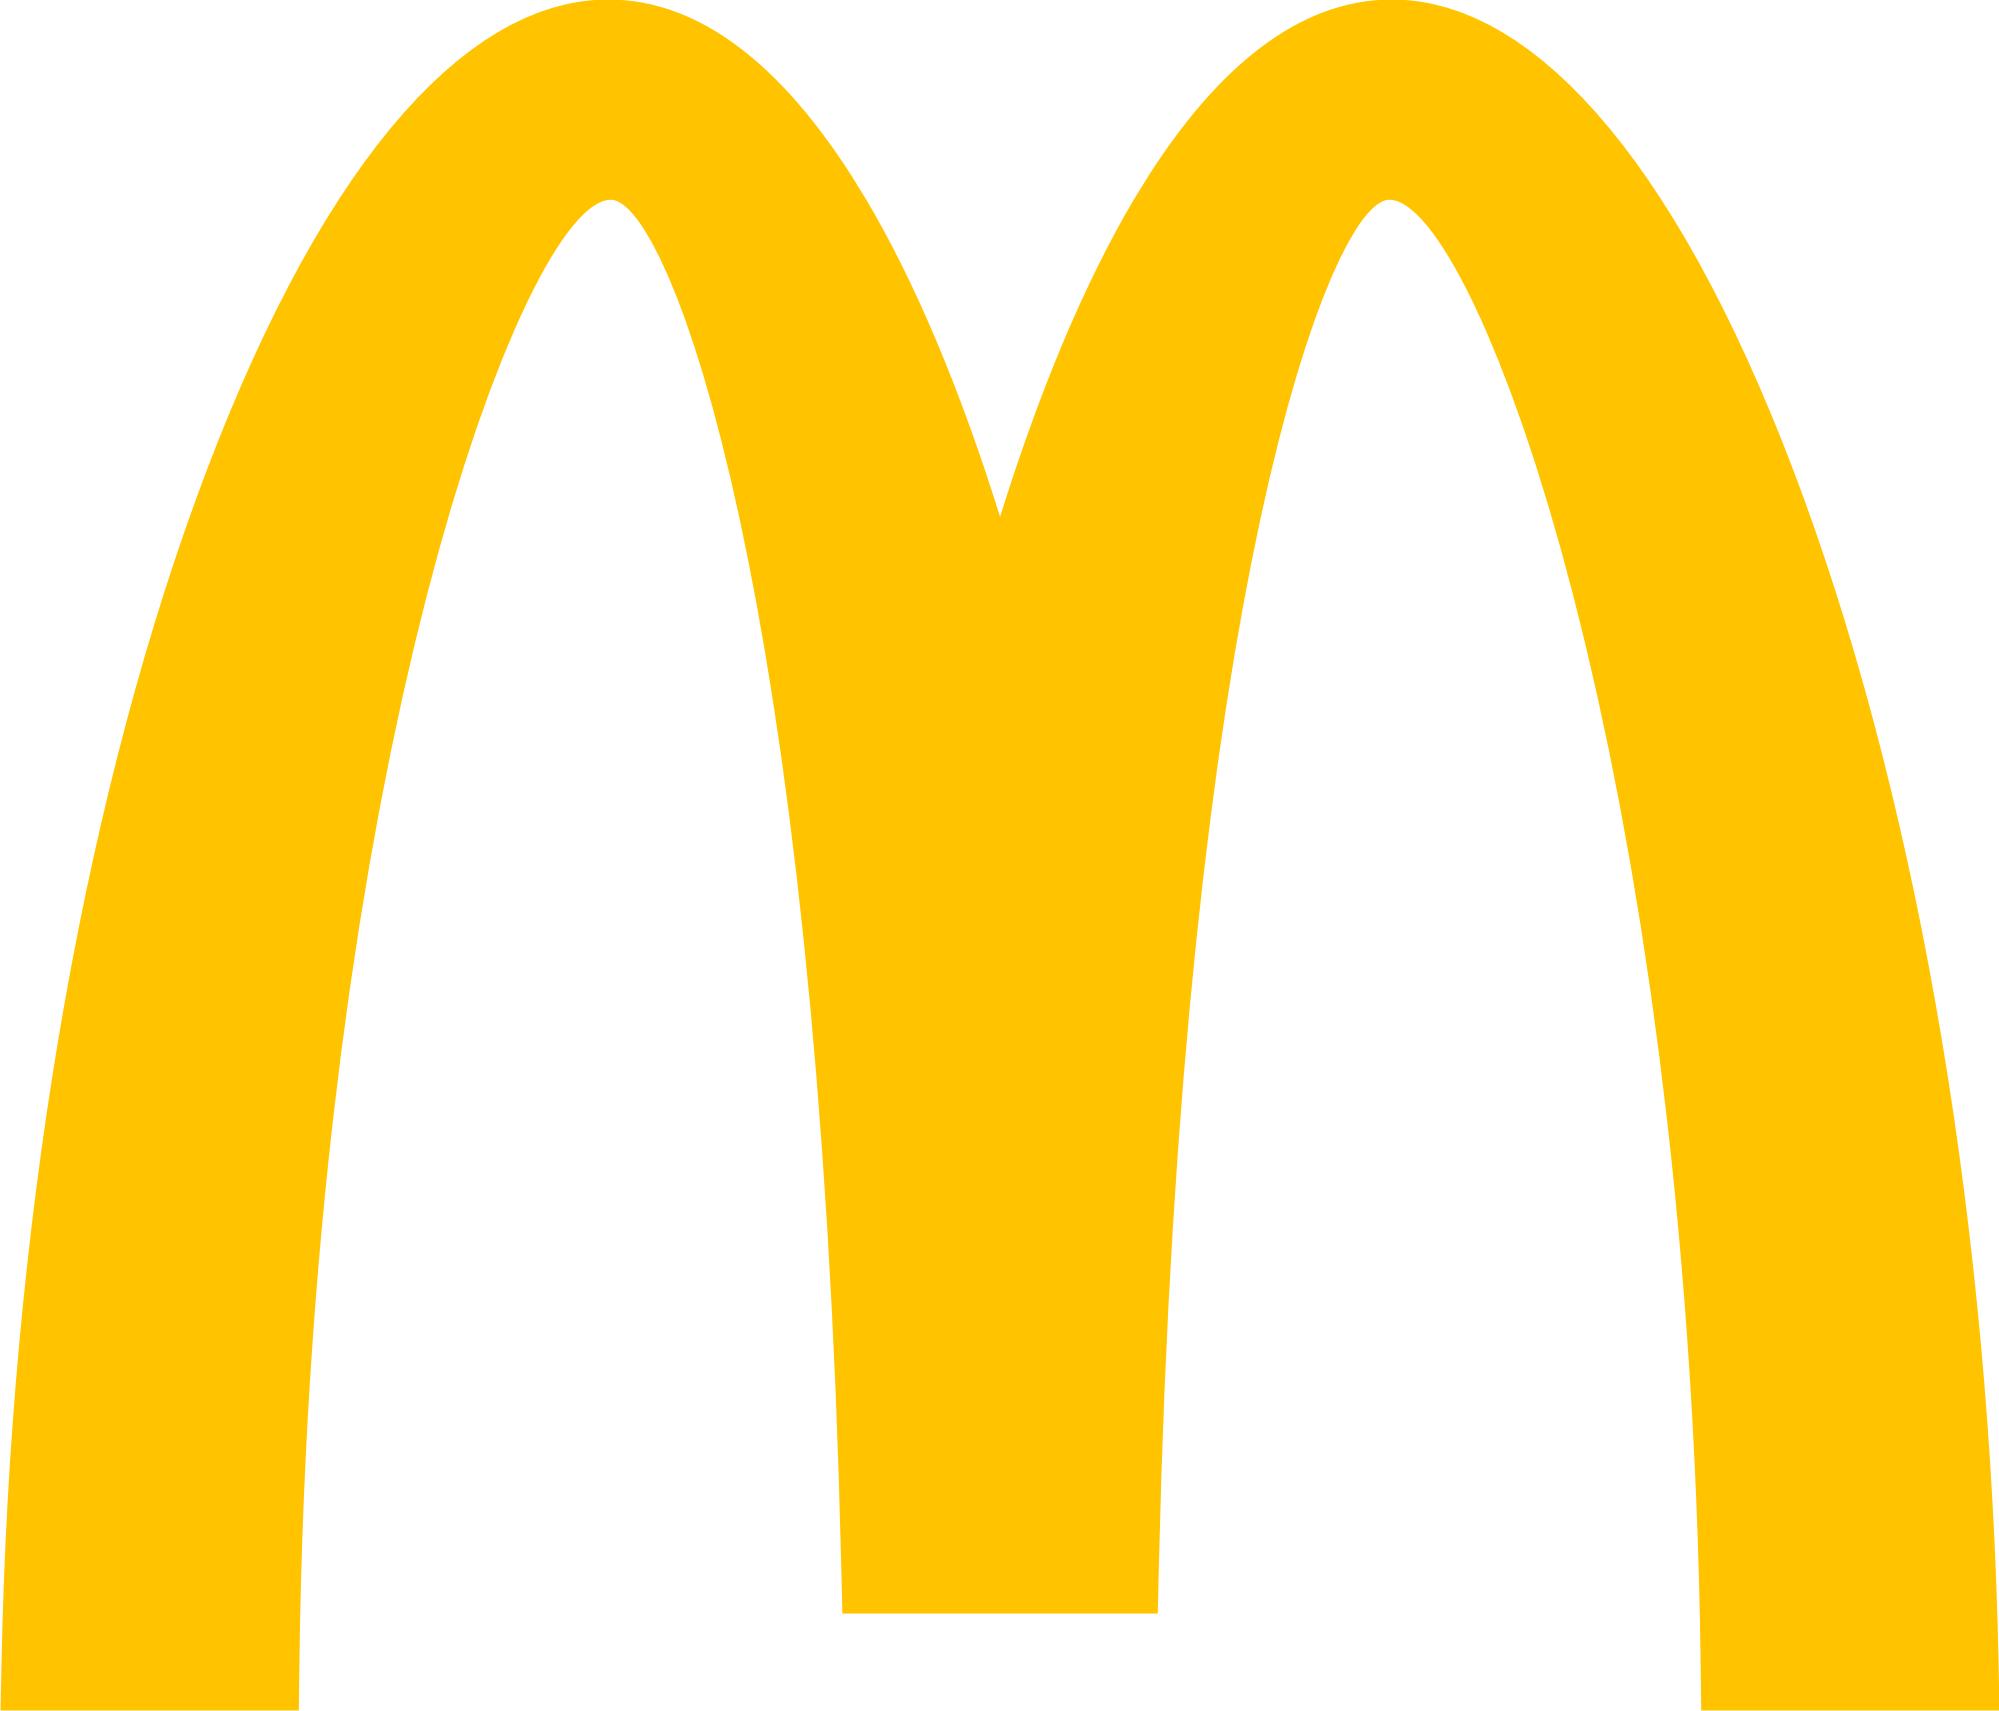 McDonald's logo PNG images free download.